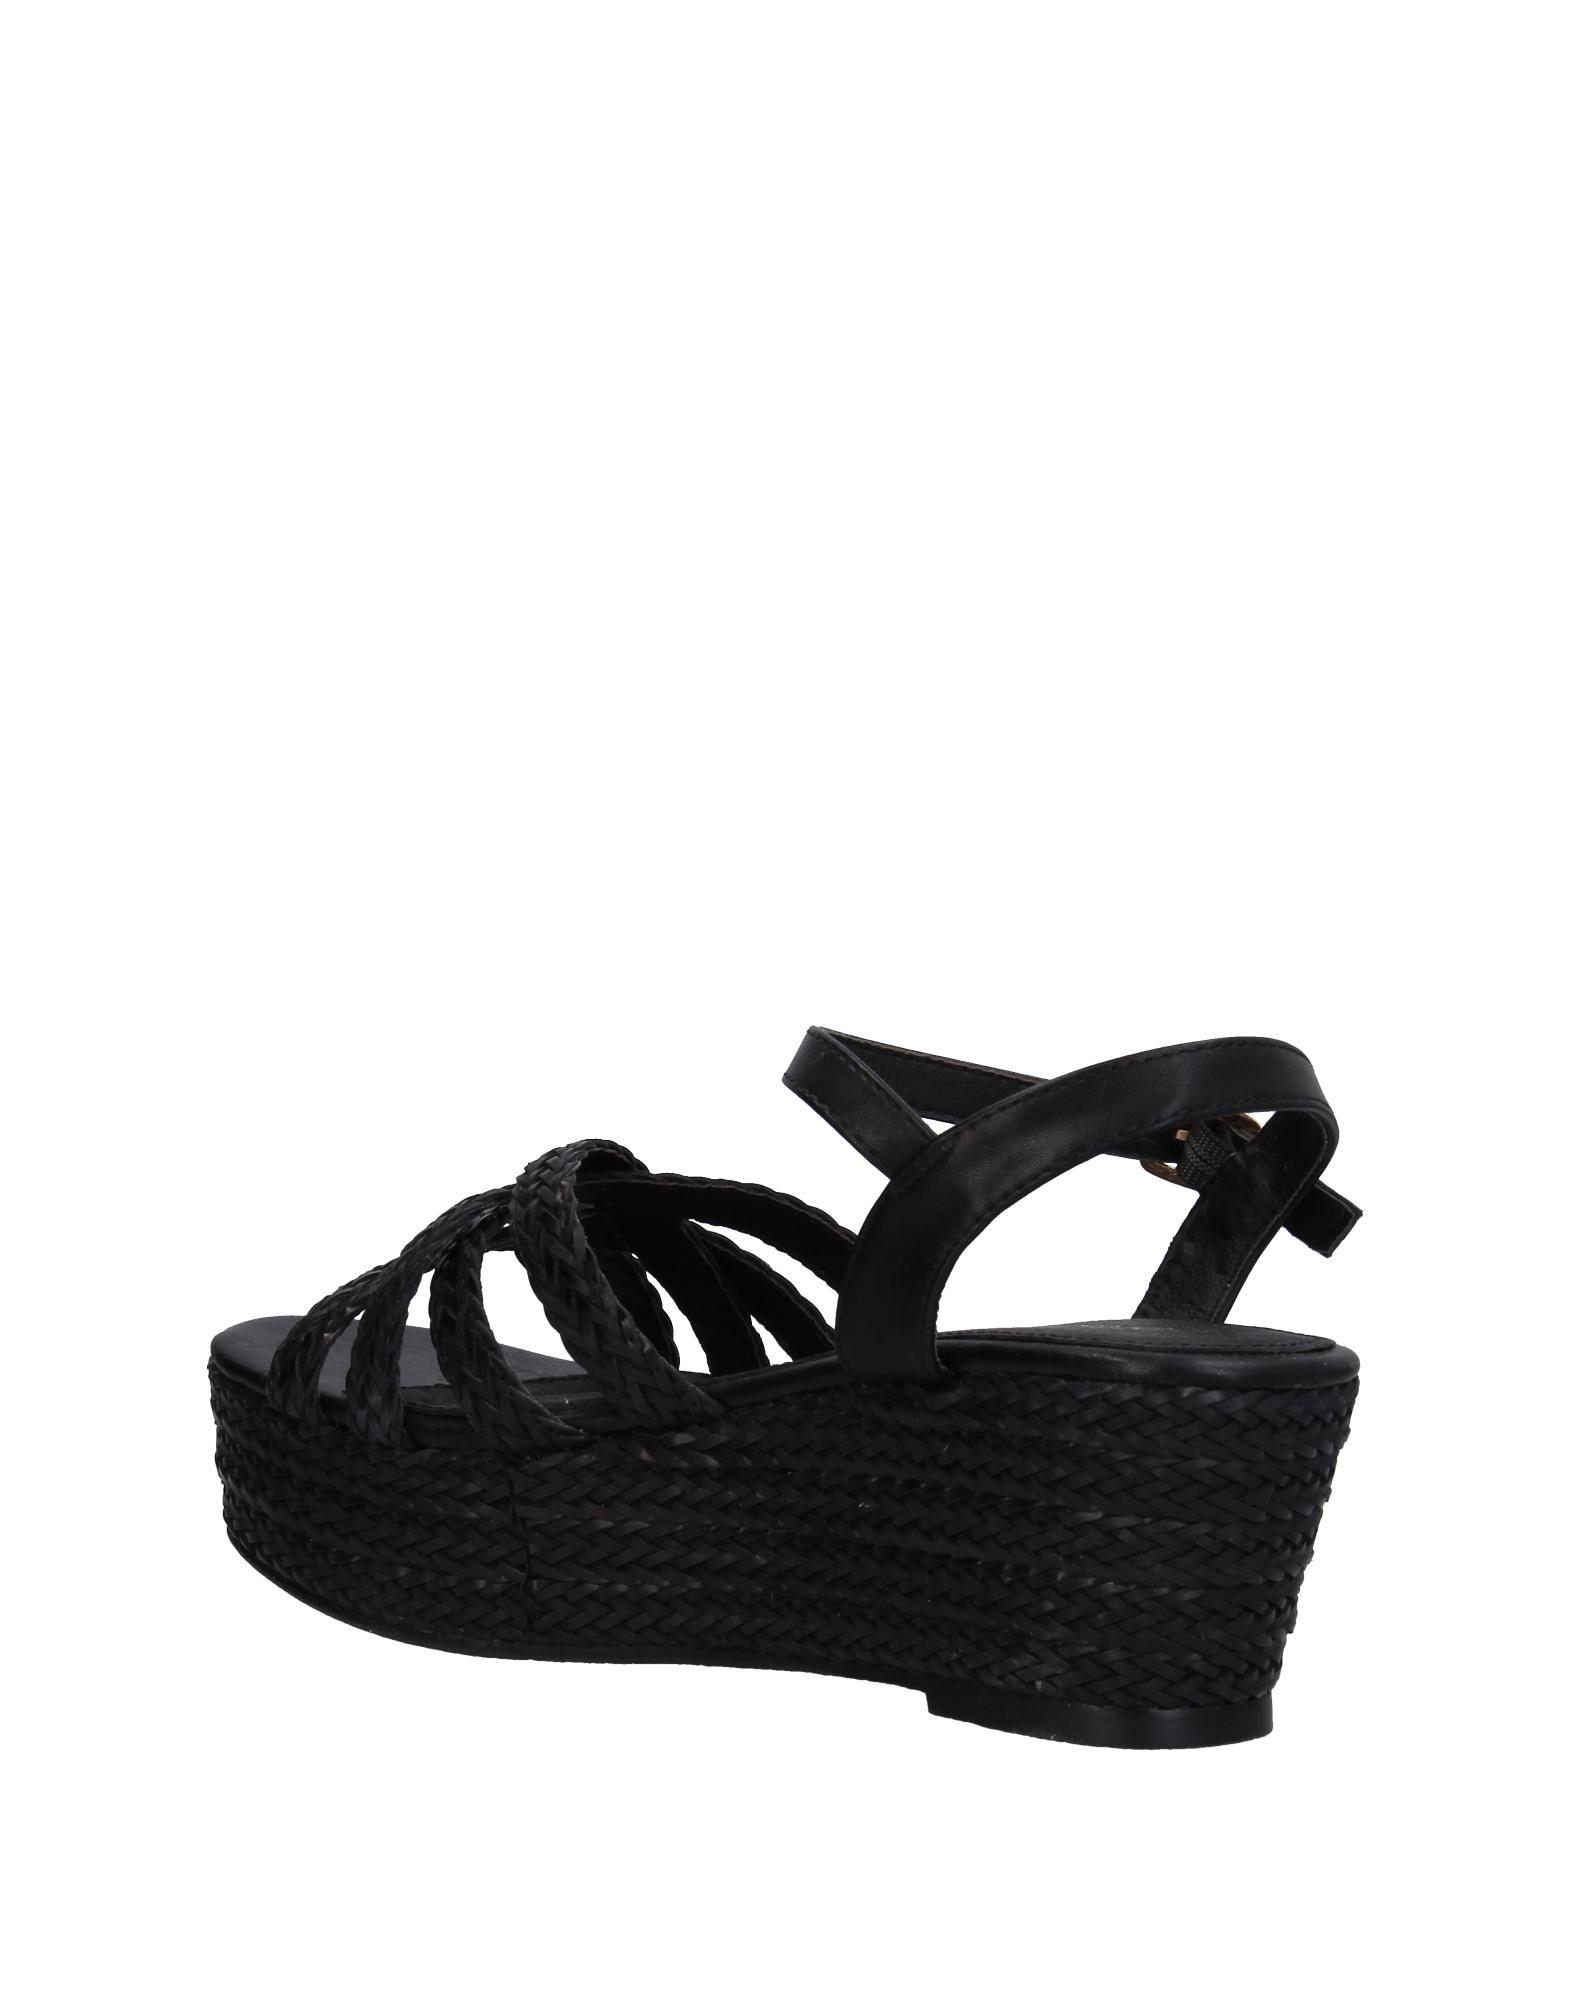 Stellaberg Gute Sandalen Damen  11378328HB Gute Stellaberg Qualität beliebte Schuhe 77d7e7